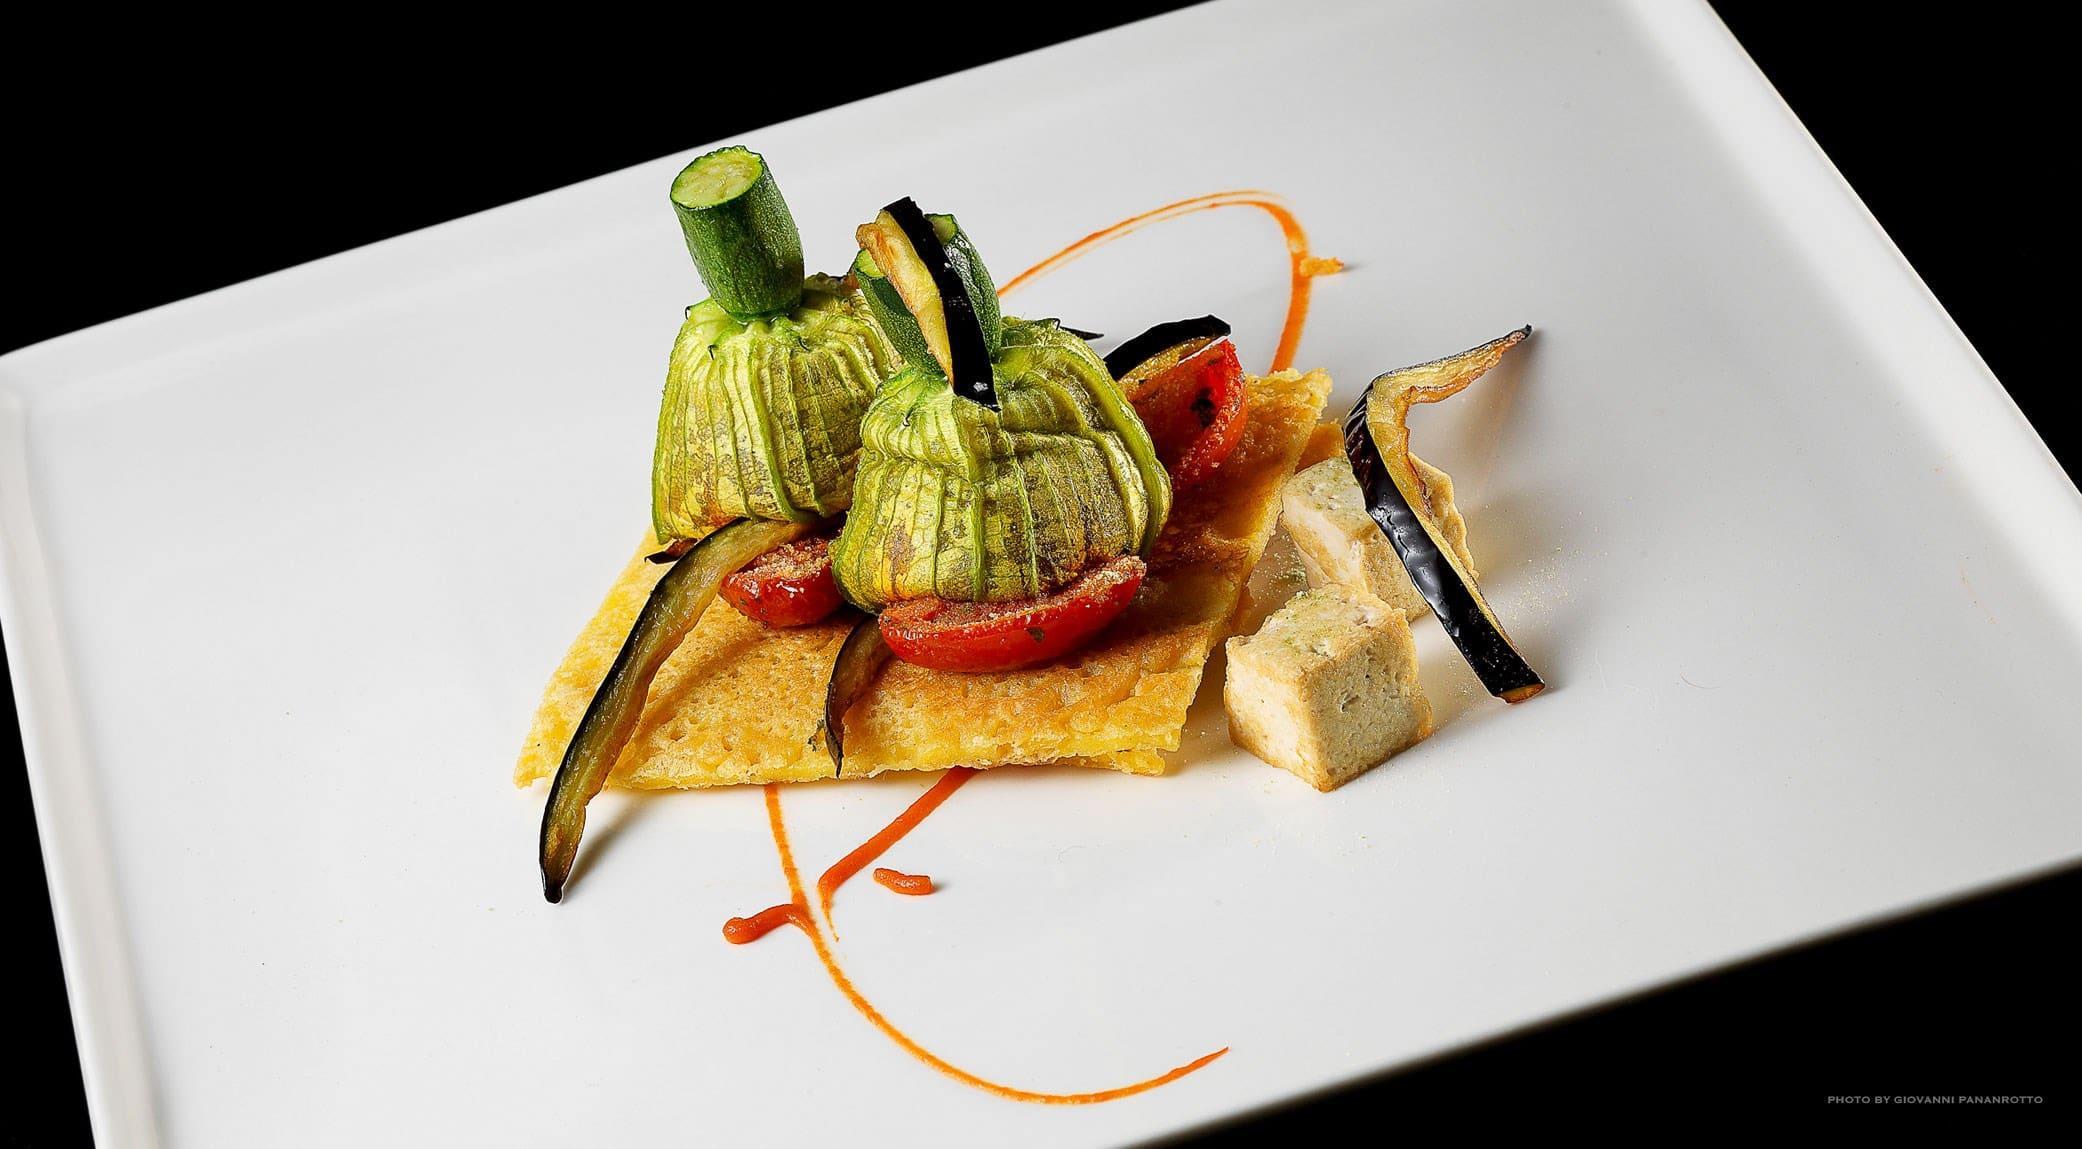 original_005-zucchini-carla-aradelli.jpg